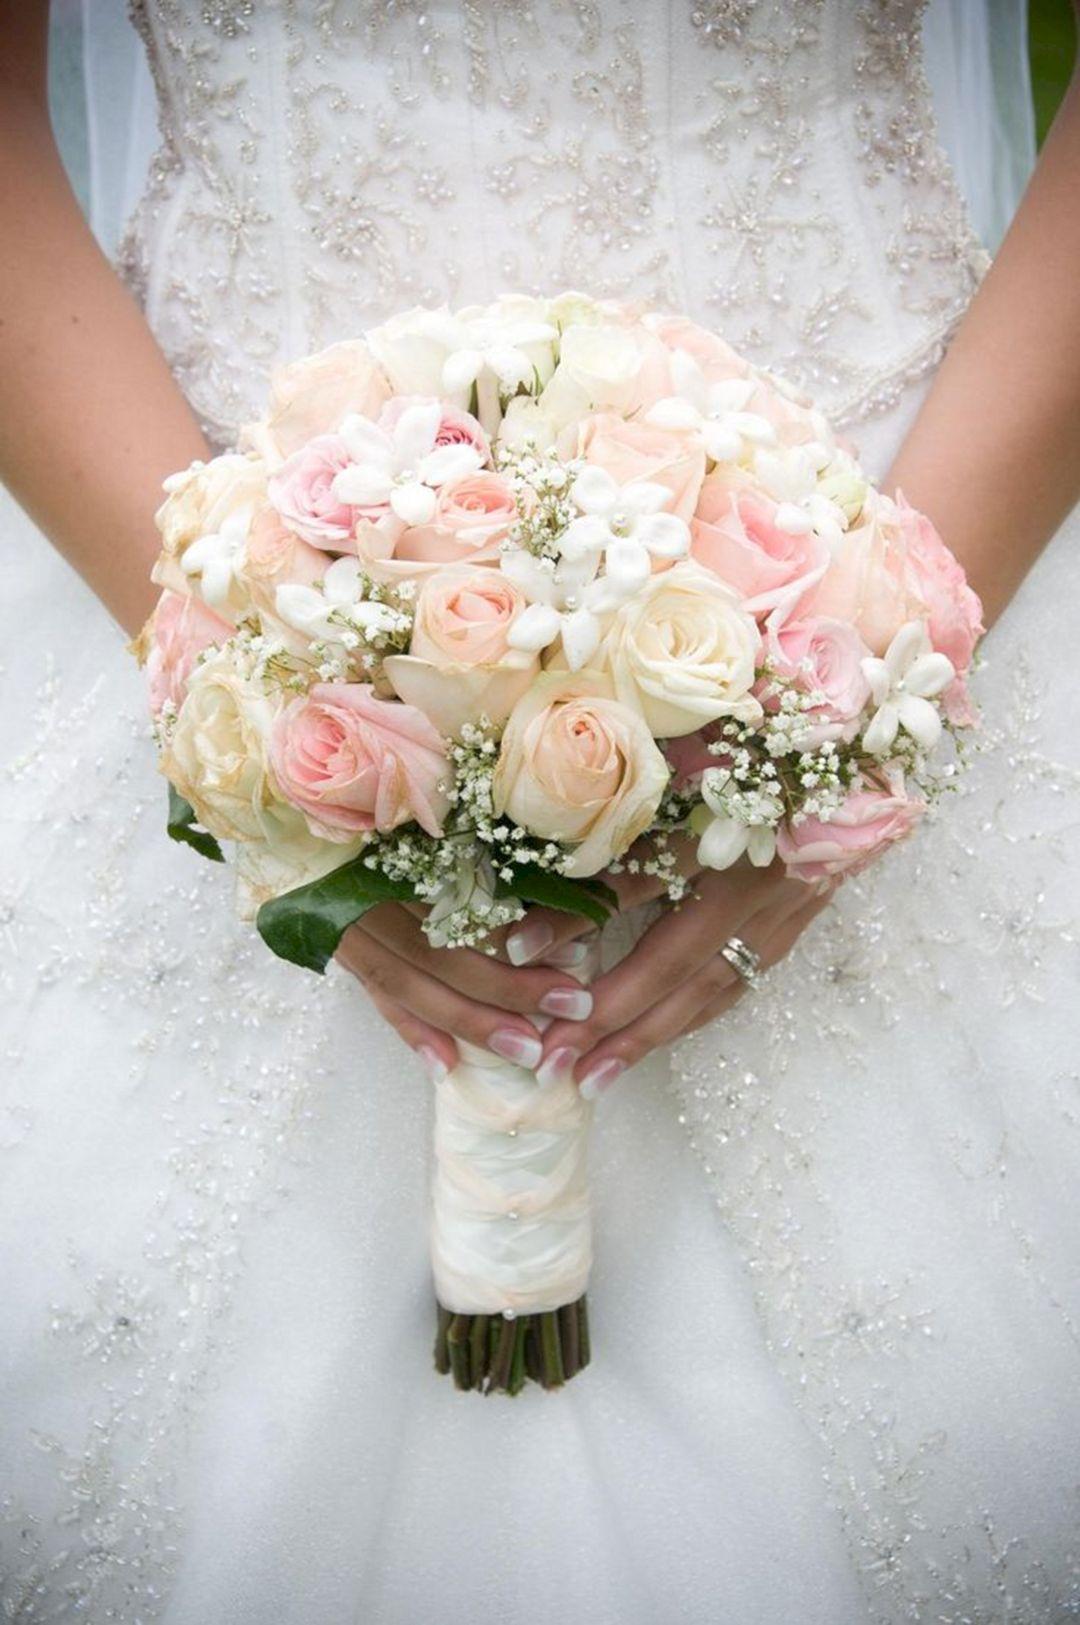 Great 10 Beautiful White Wedding Bouquet Ideas For Wedding Inspiration Https Oo Wedding Bouquets Pink Wedding Flower Arrangements White Rose Bridal Bouquet